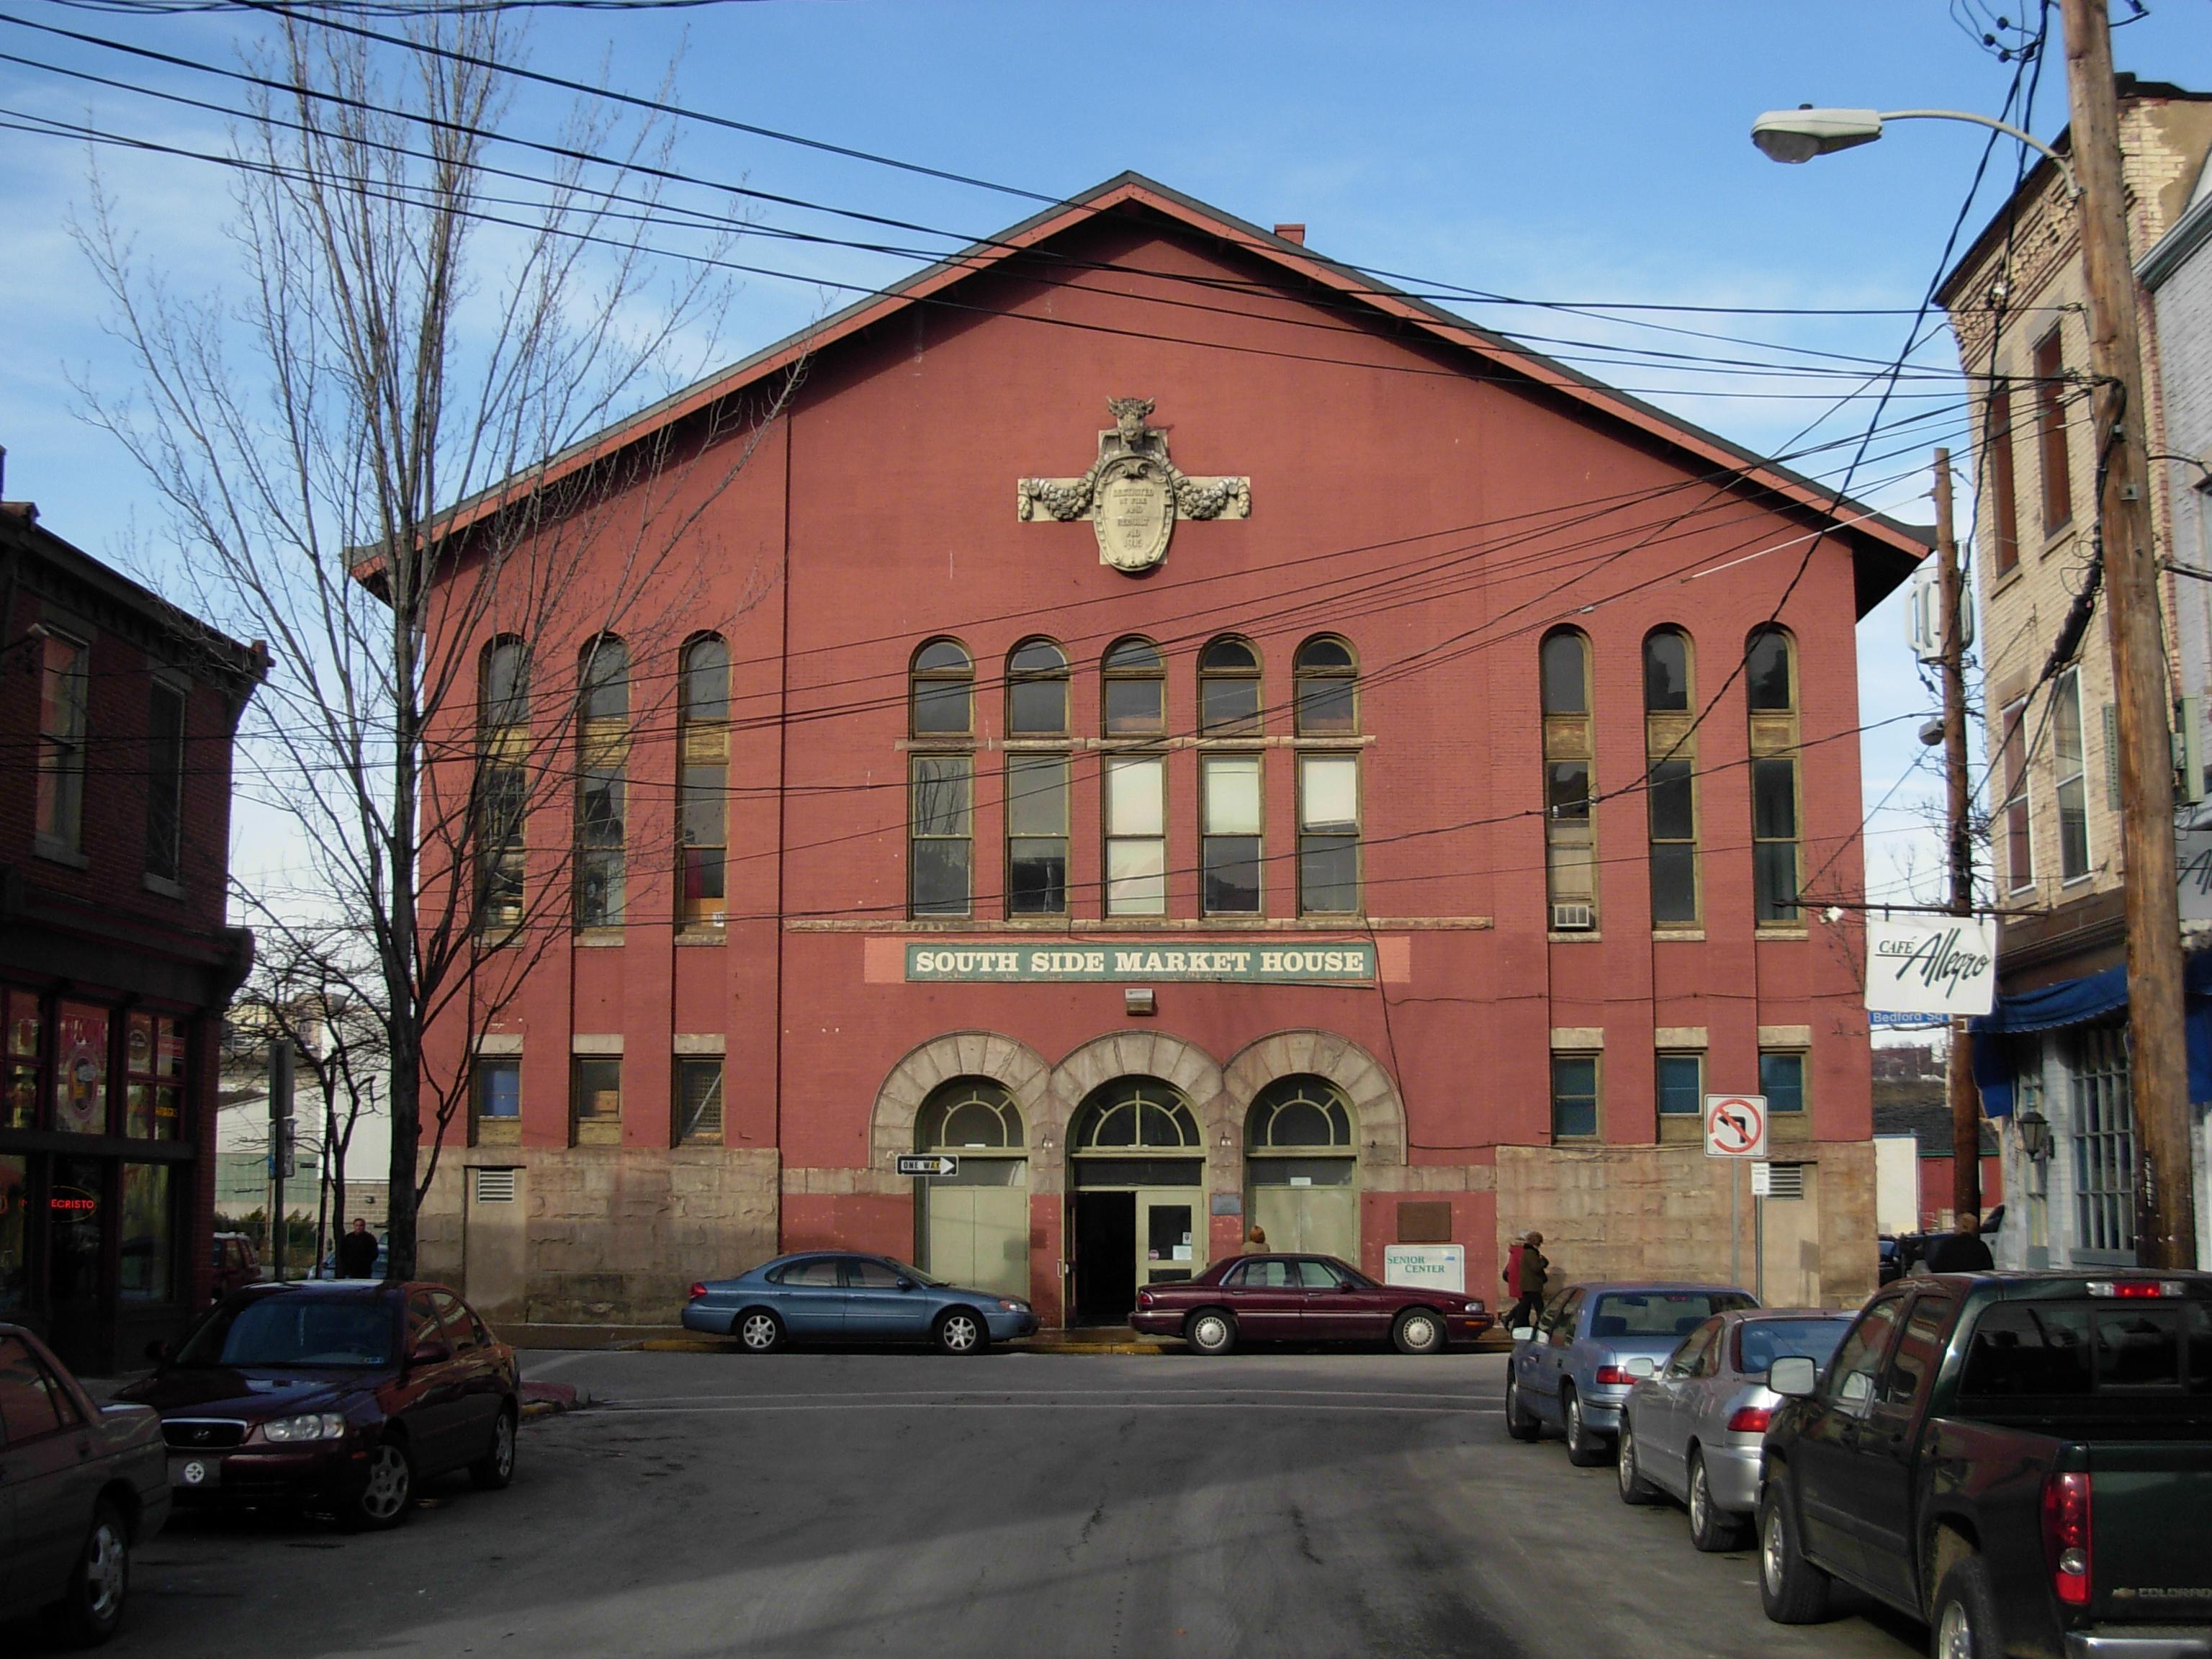 File:South Side Market House in Pittsburgh.JPG - Wikimedia ...